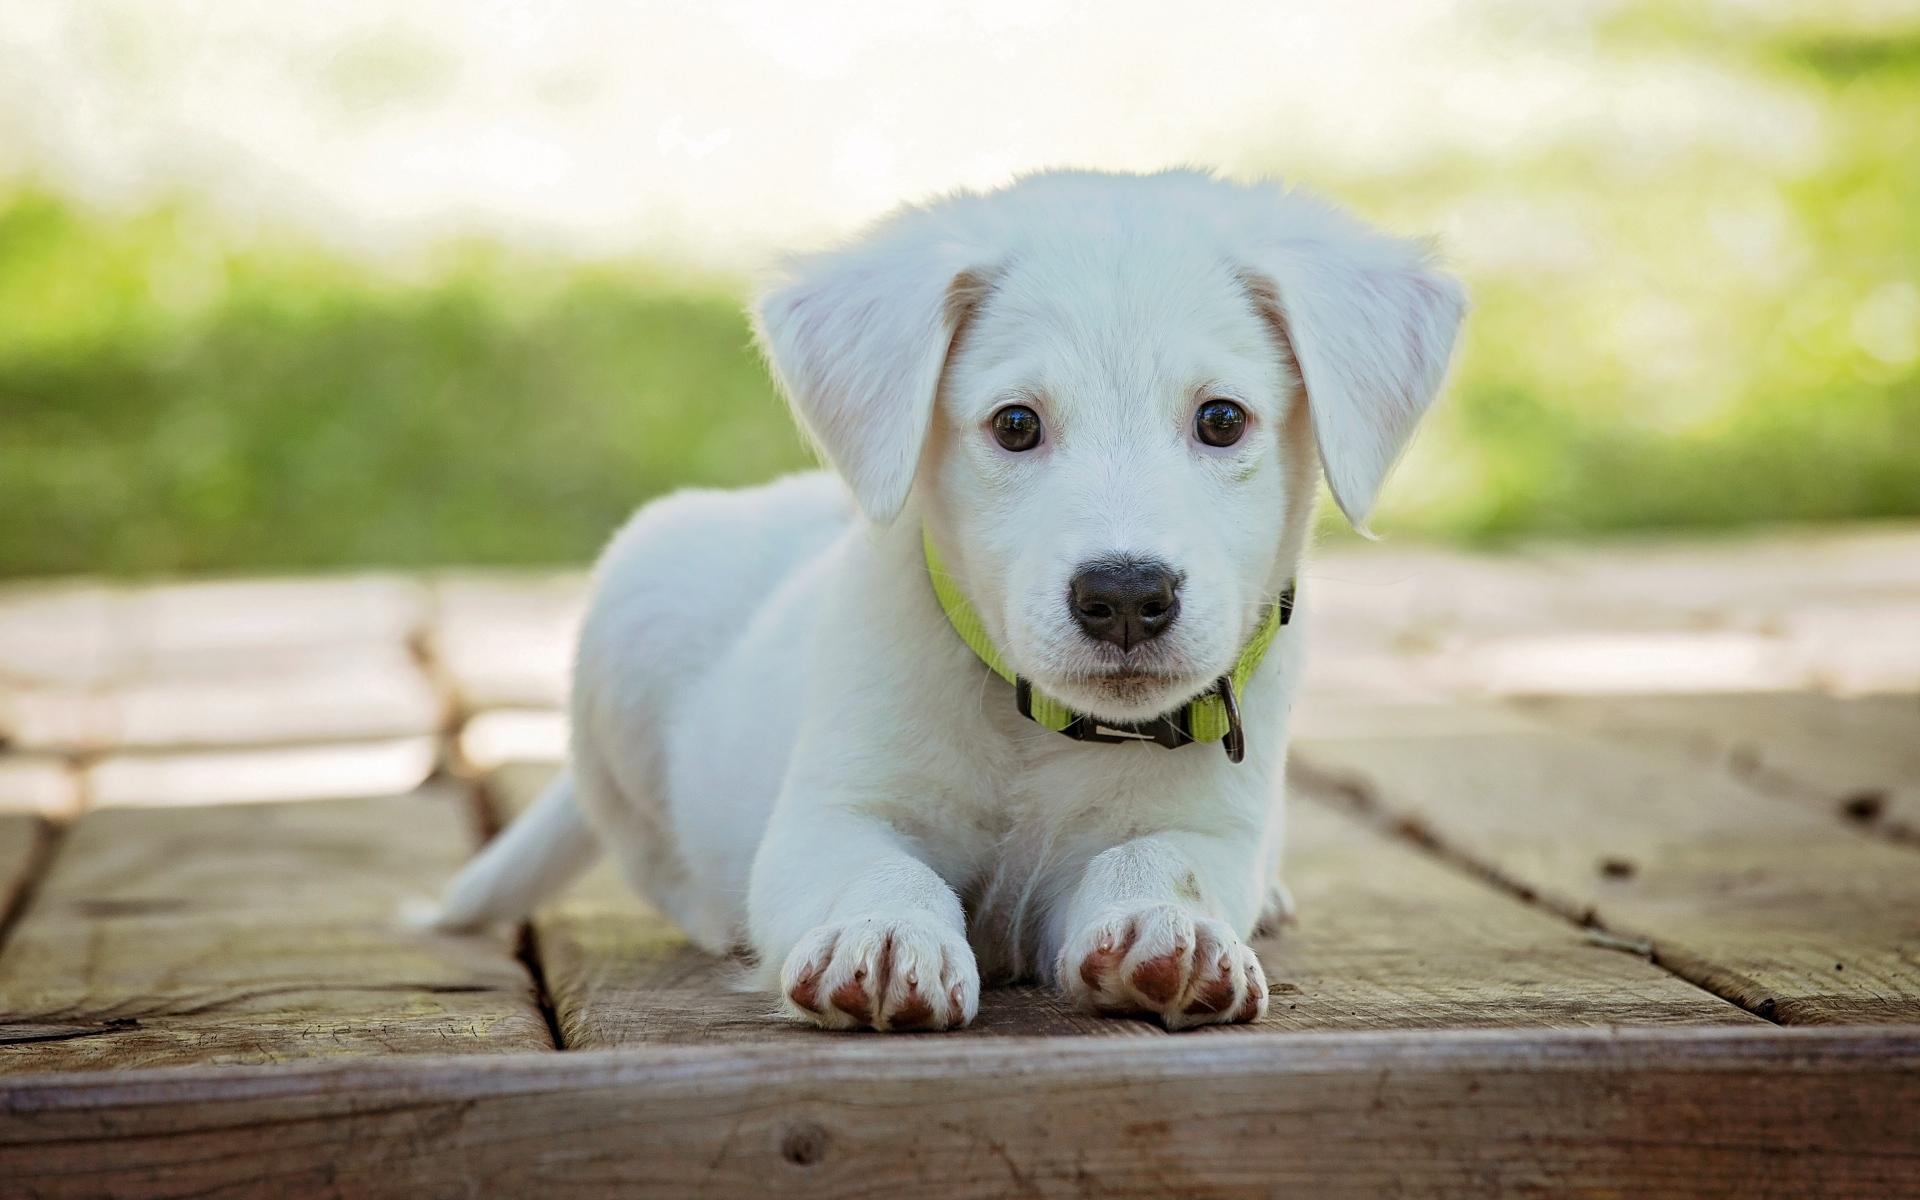 Картинки Щенок, собака, лежа, белый фото и обои на рабочий стол